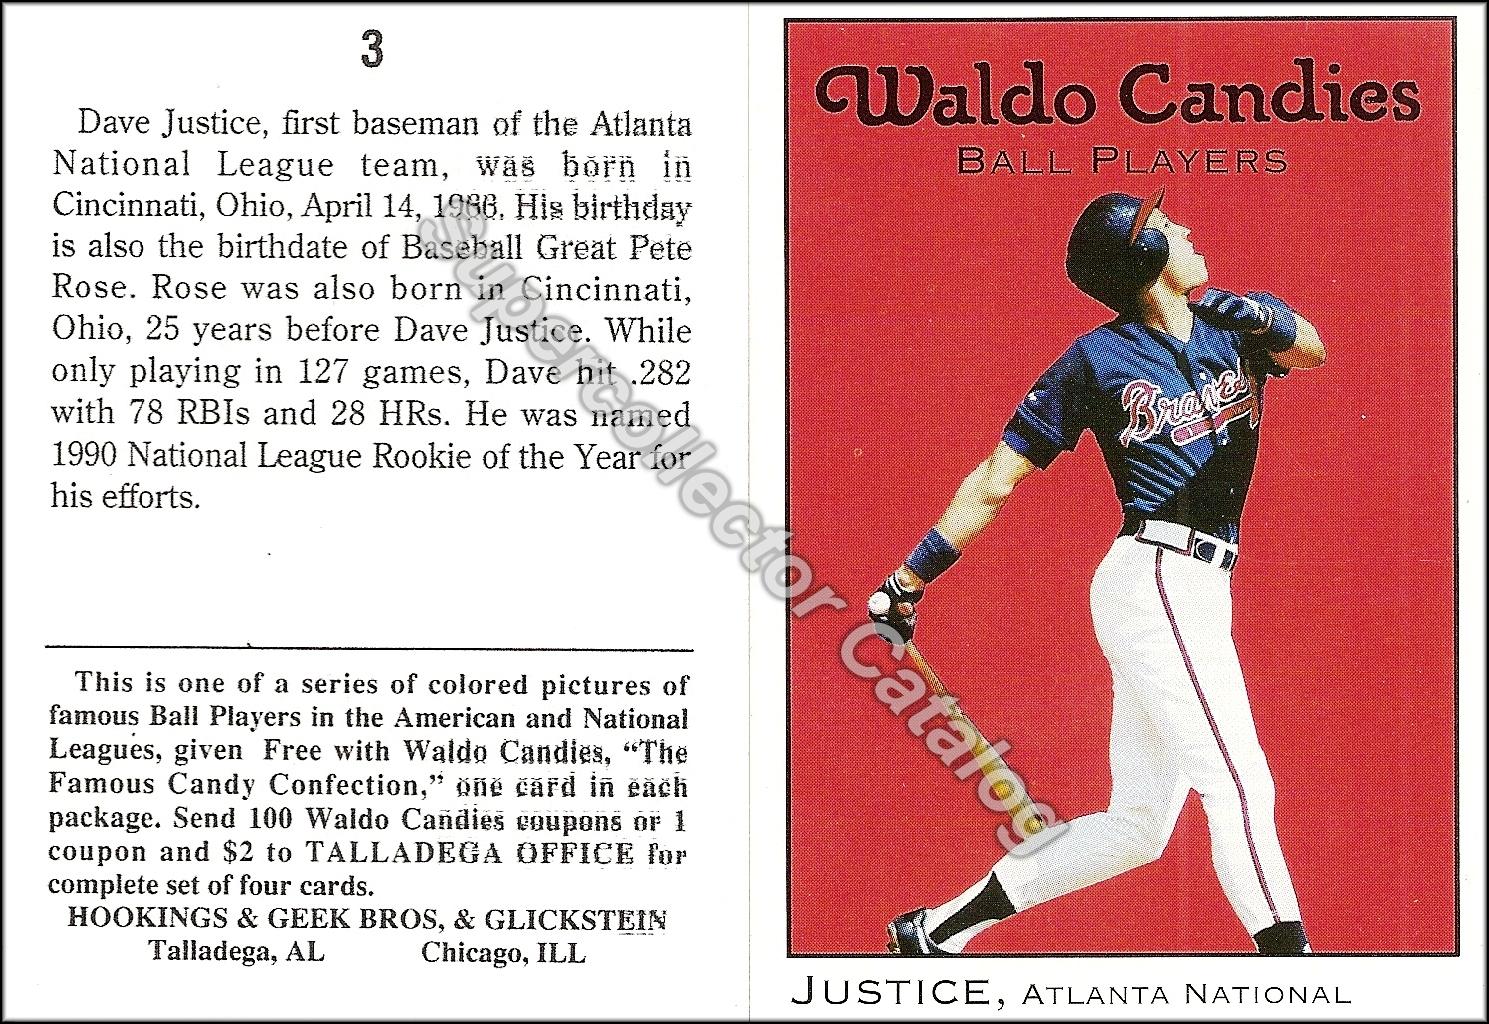 1991 Waldo Candies